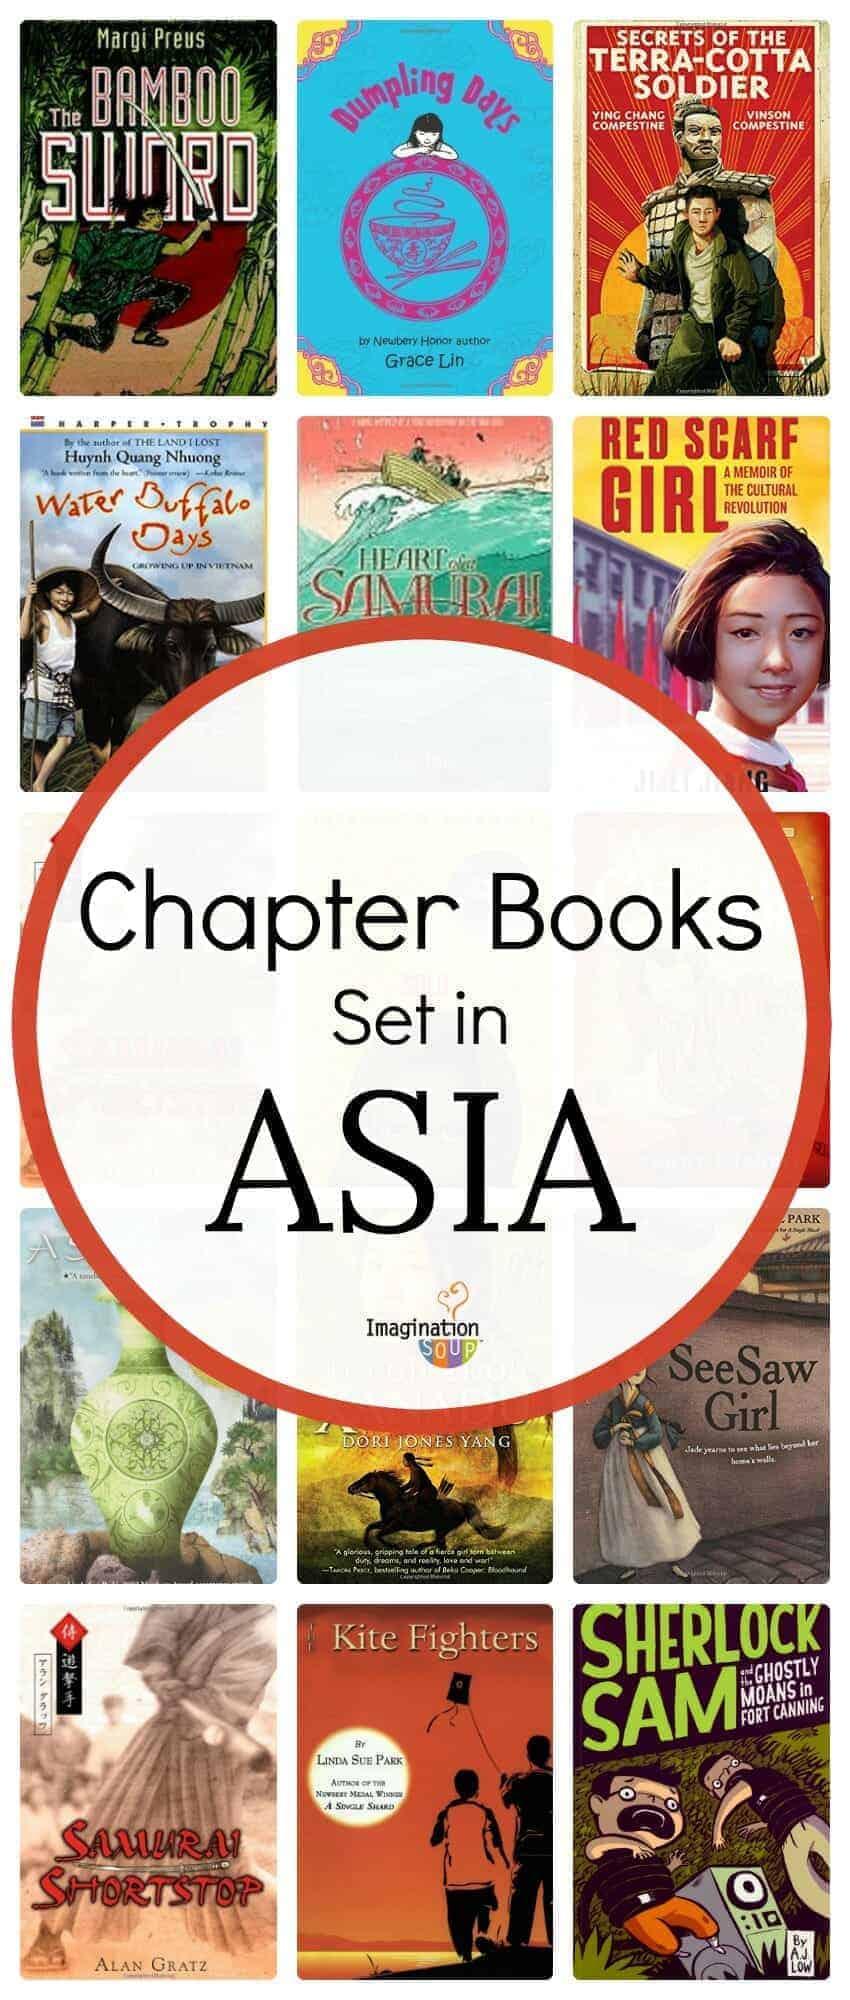 chapter books set in Asia (China, Japan, Korea, Hong Kong)